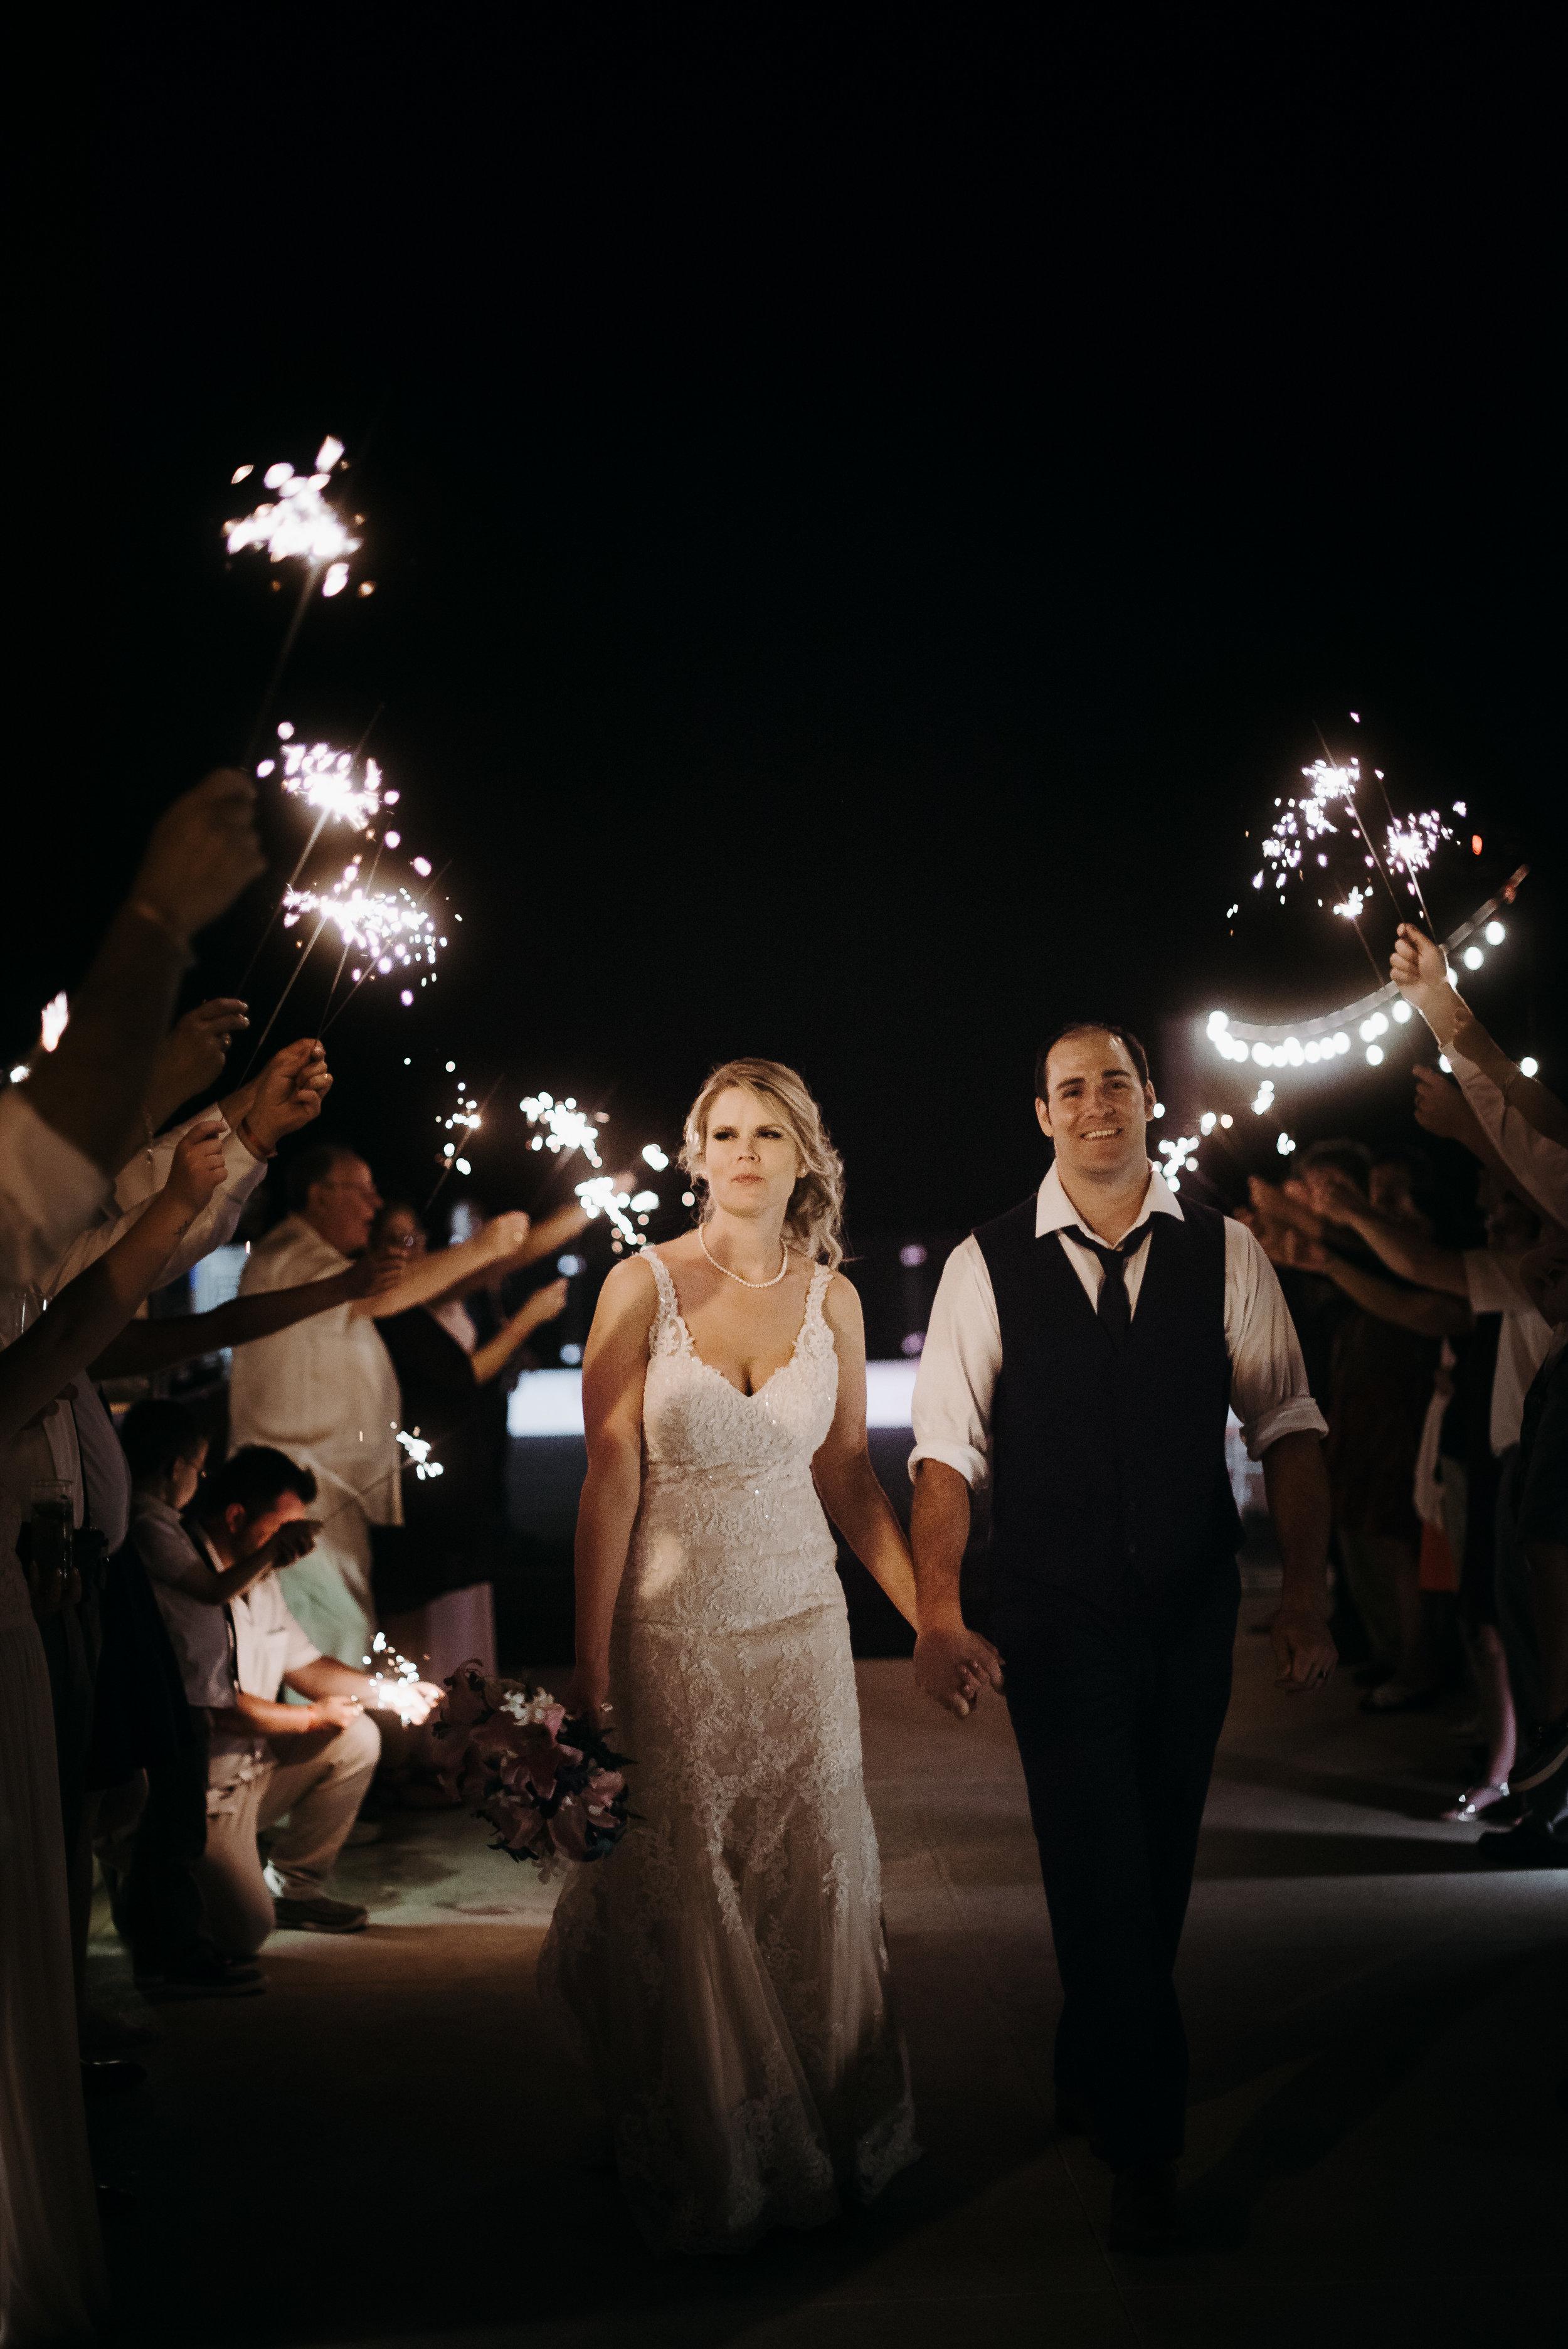 alberta wedding photography - brittany ross photo